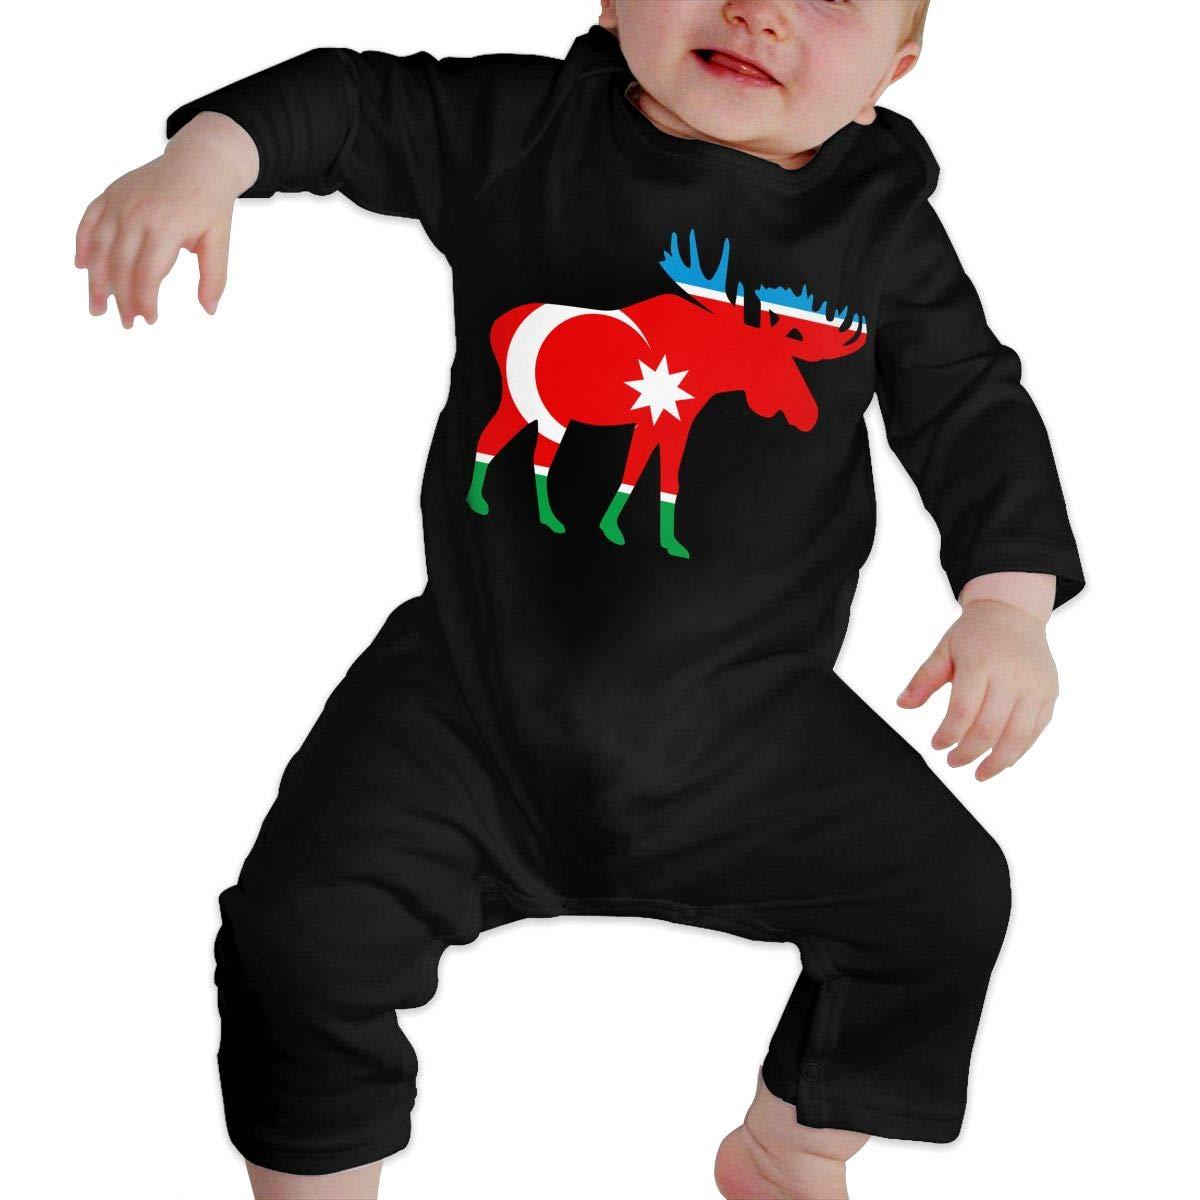 Cute Azerbaijan Moose Jumpsuit U99oi-9 Long Sleeve Cotton Bodysuit for Baby Boys and Girls